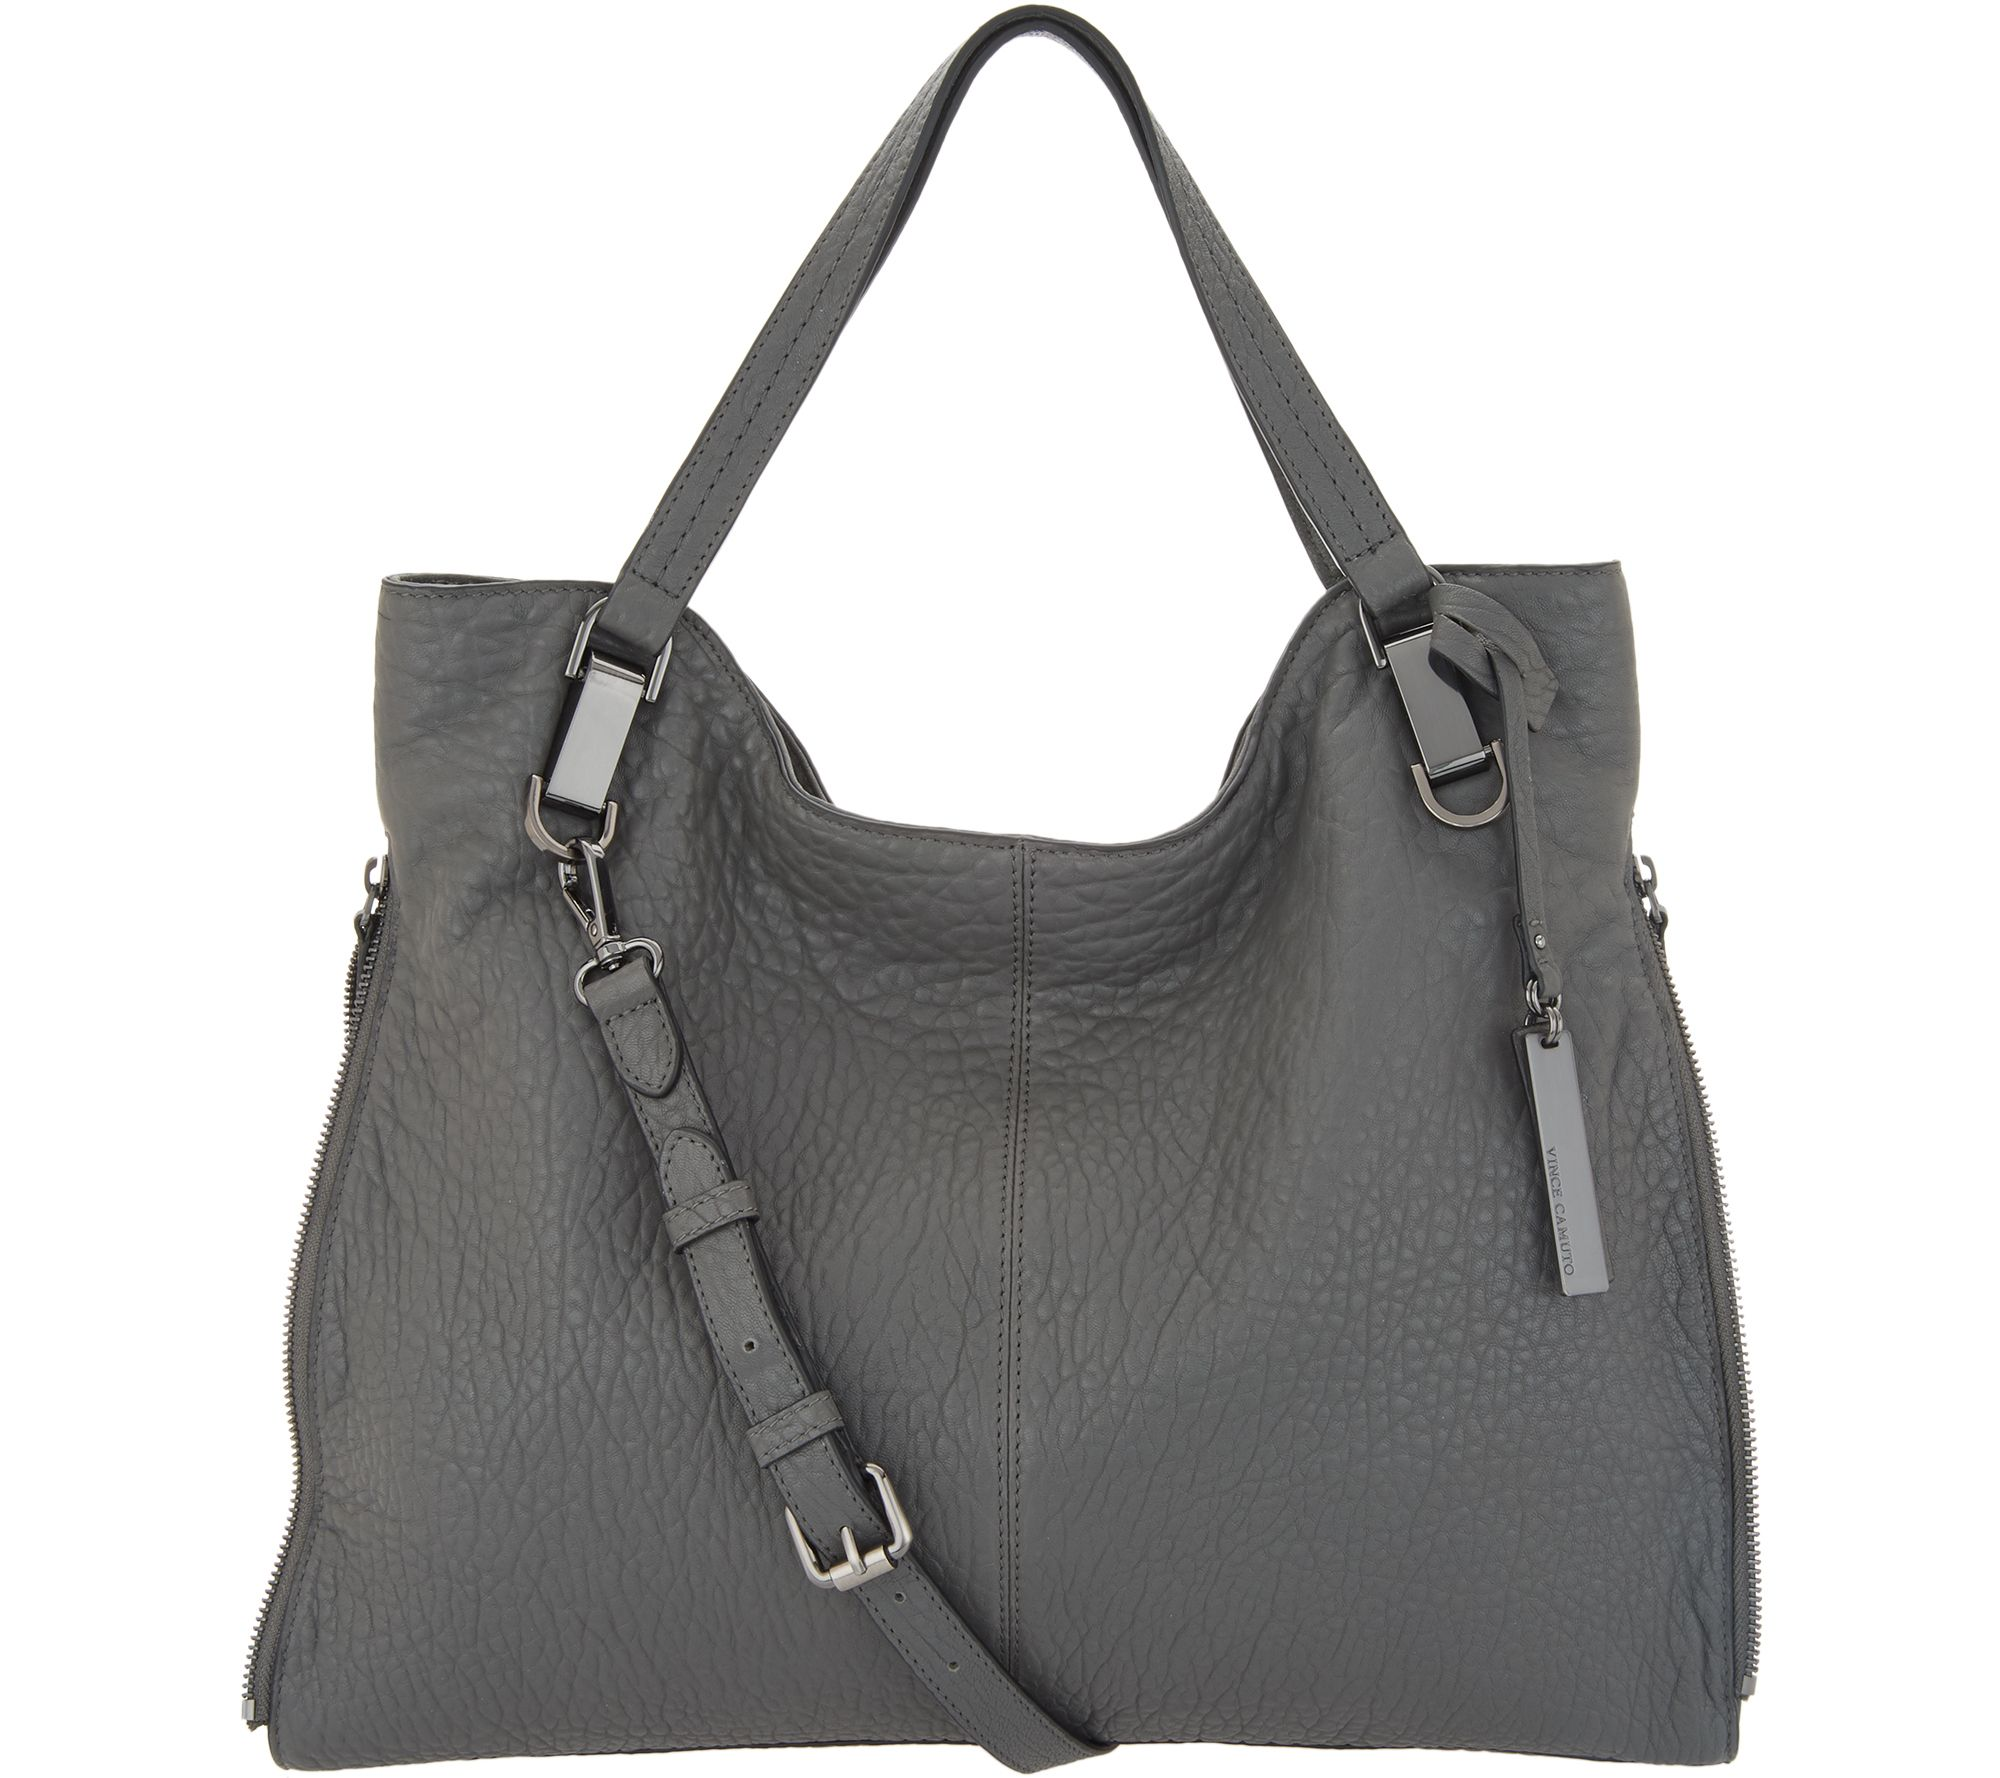 3df537cee53 Vince Camuto Lamb Leather Tote Handbag - Eliza - Page 1 — QVC.com